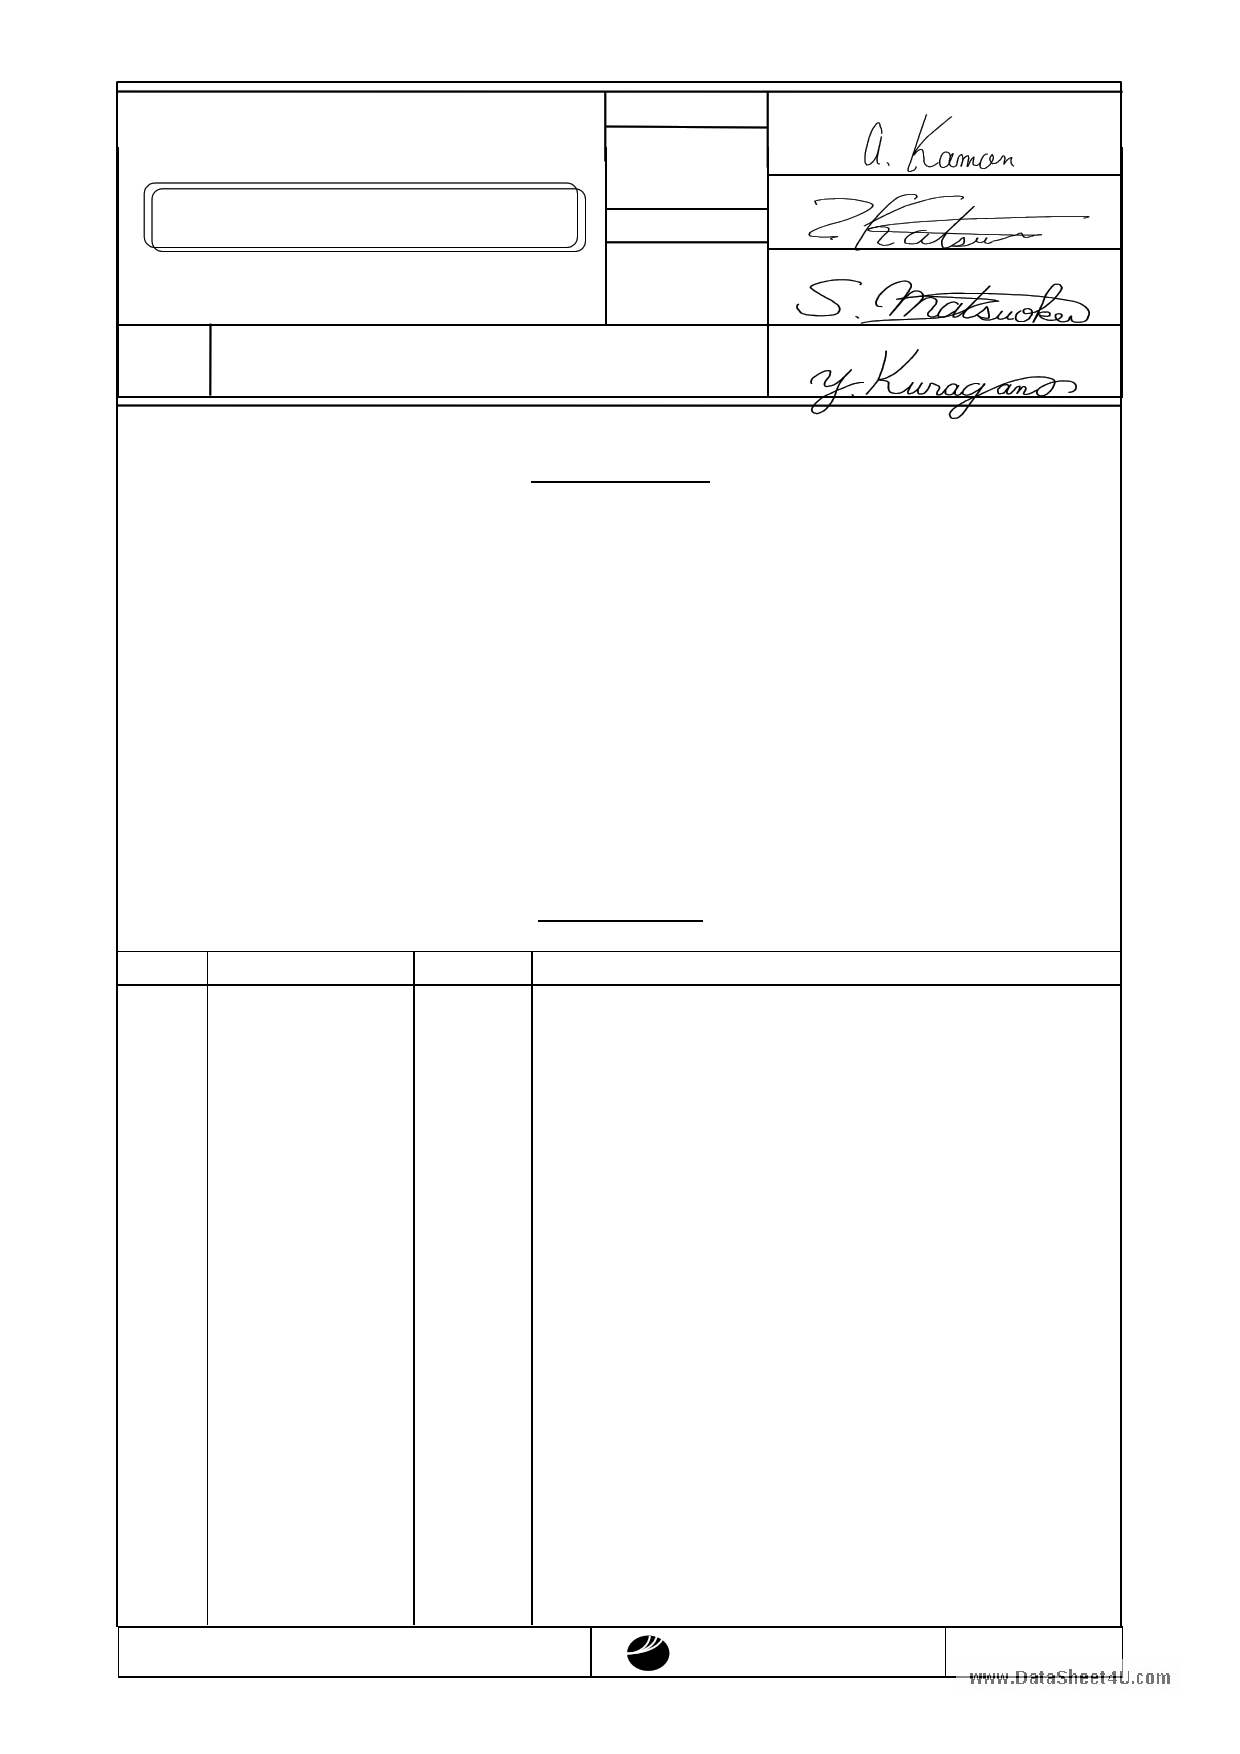 DMC20434HE datasheet